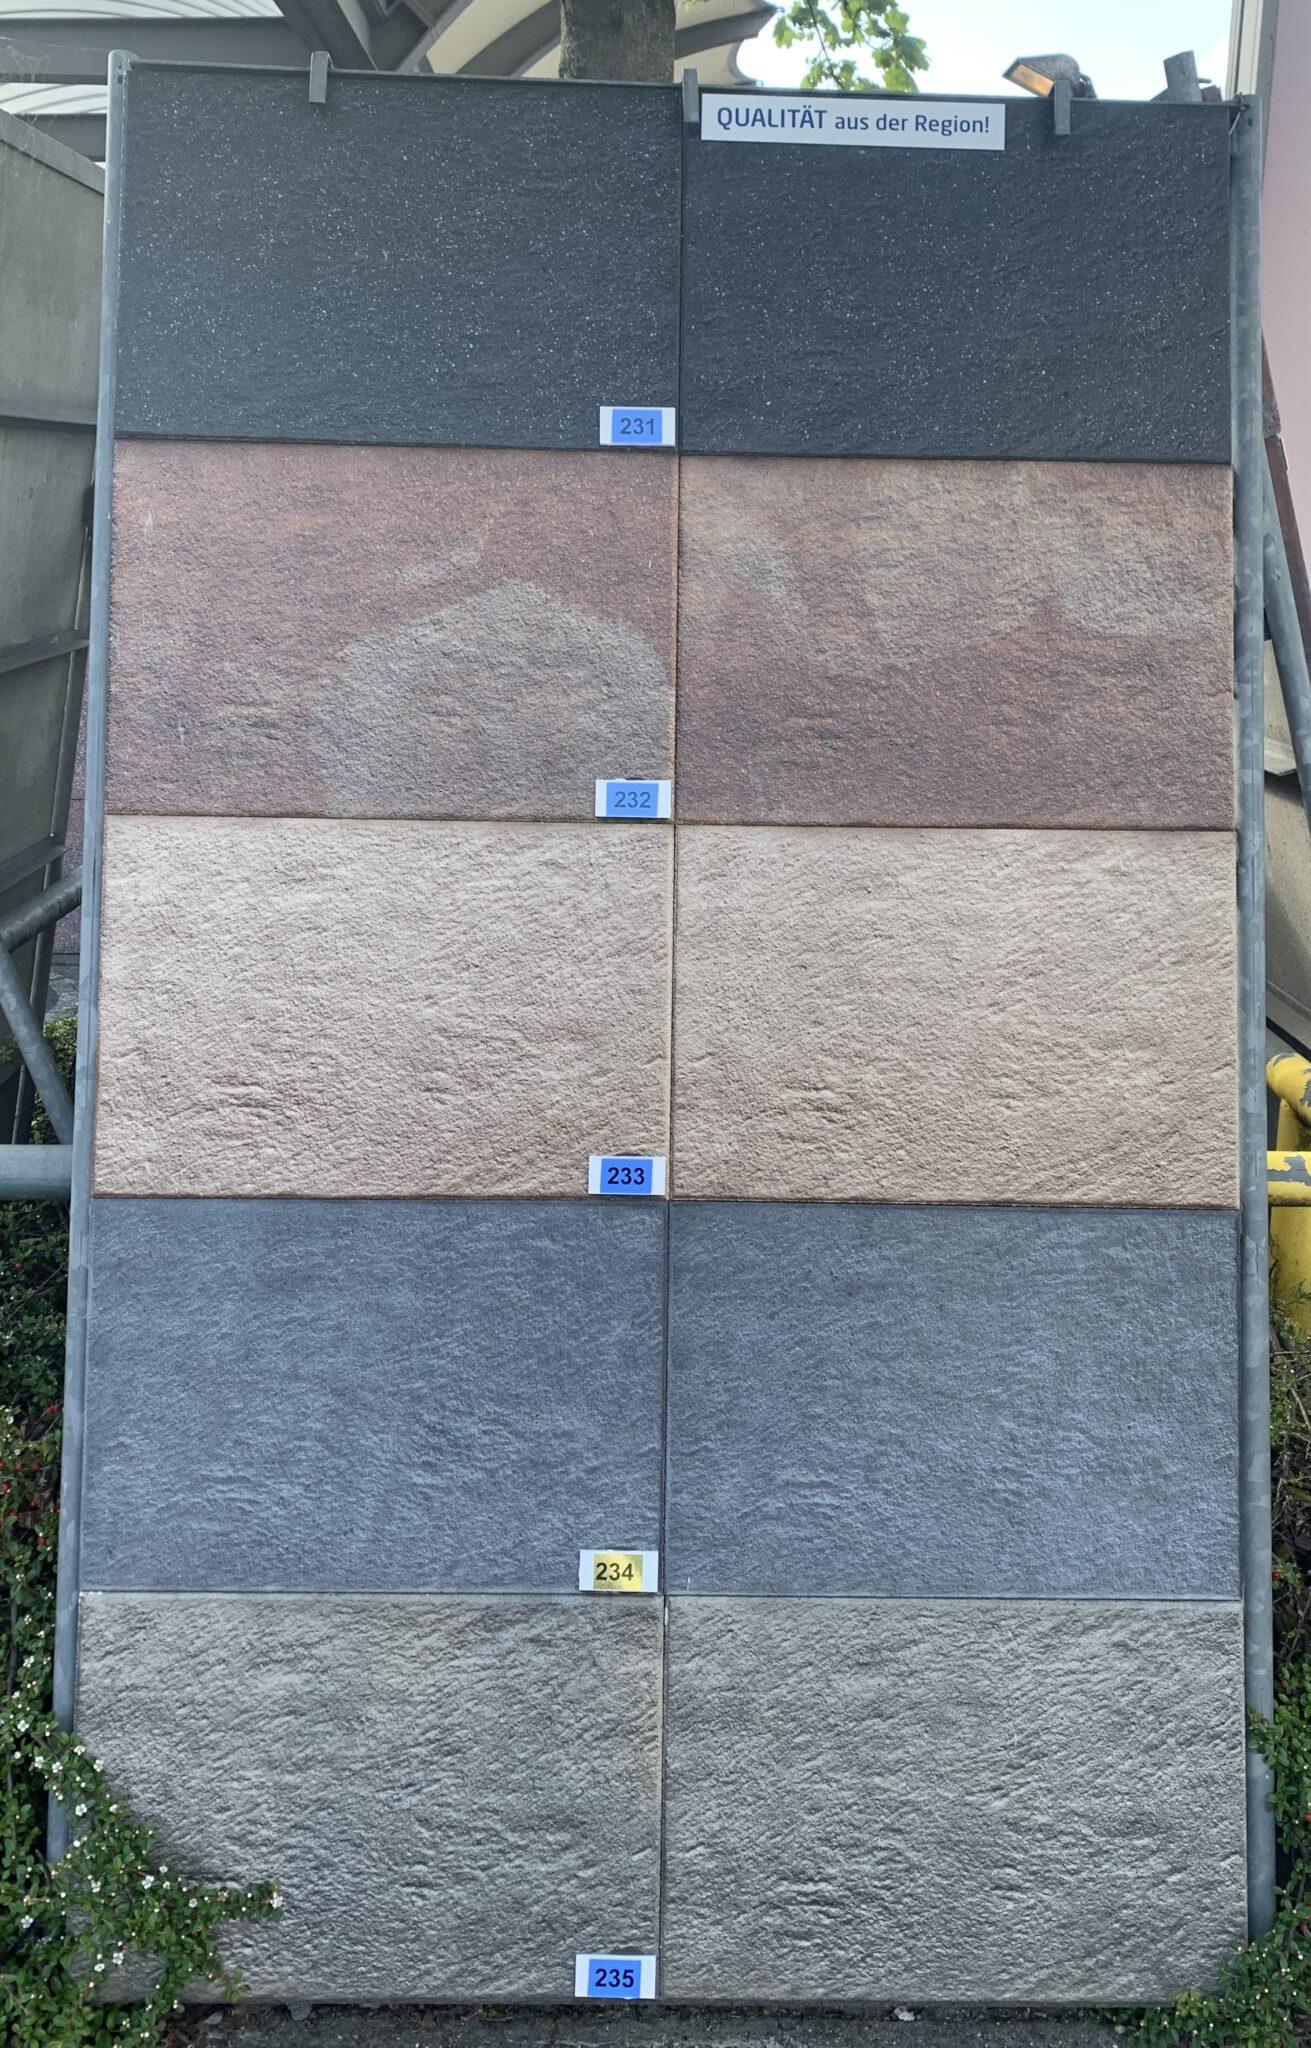 Terrassenplatte Novaclean efecto kupfer bei Stolzenbach Baustoffe in Bremen kaufen